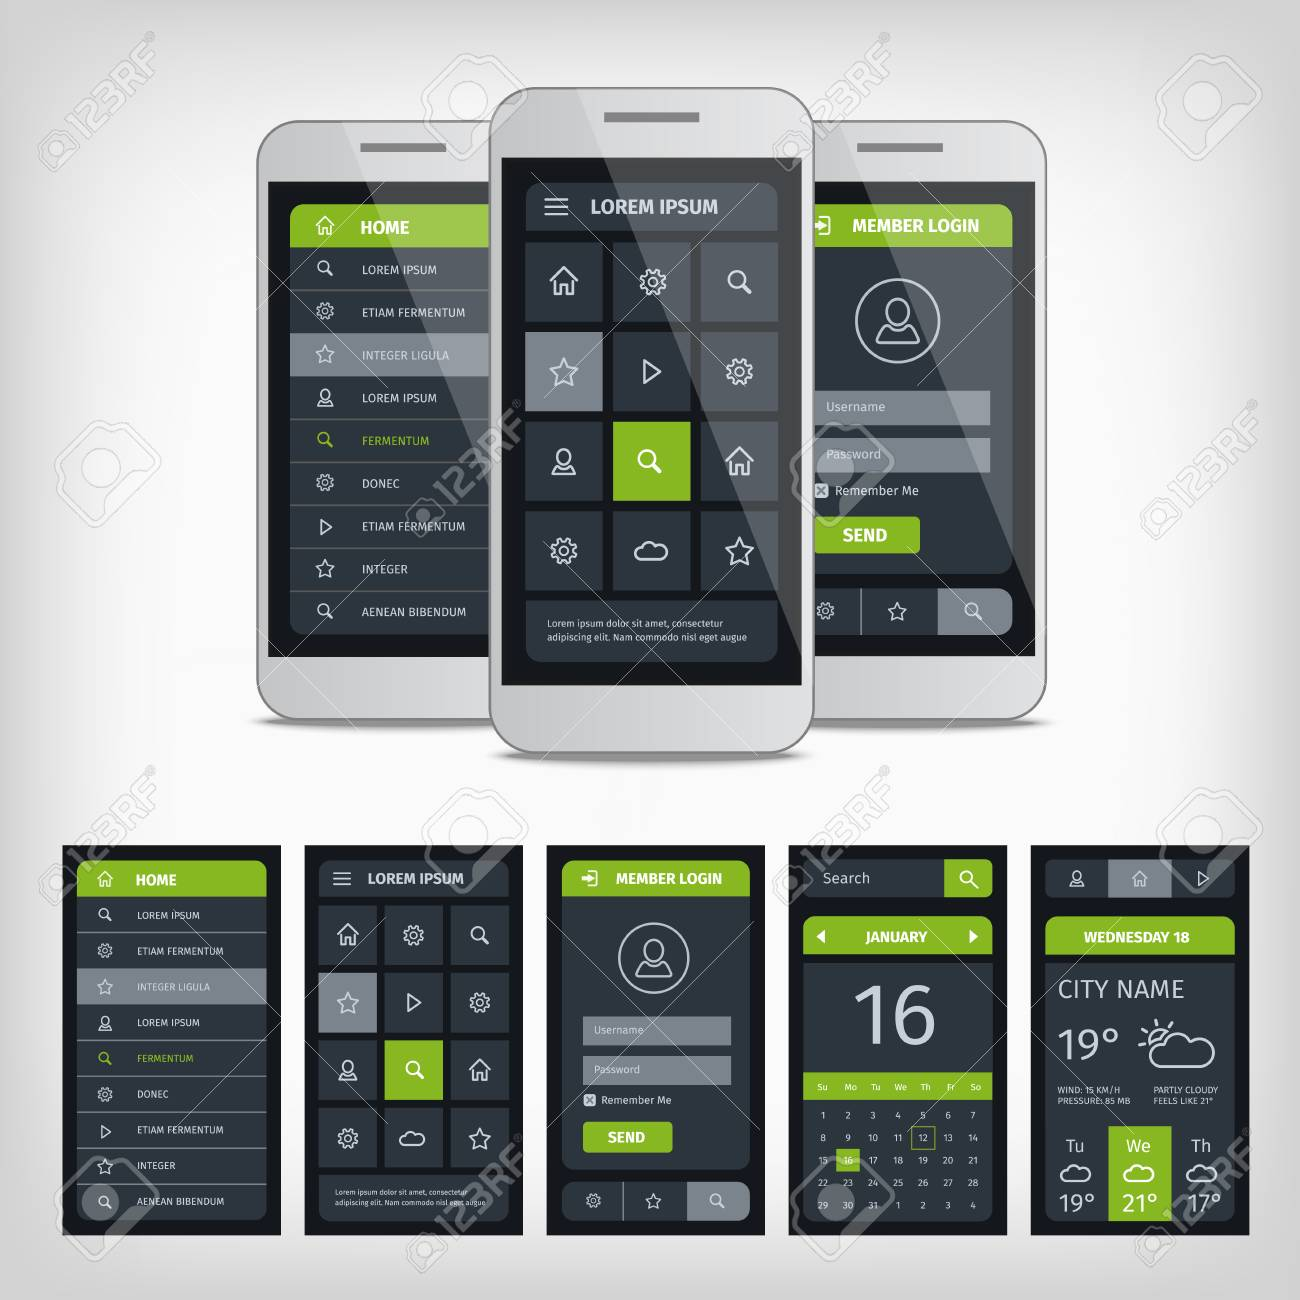 set of mobile user aplication interface template mobile app ui kit illustration with mockup